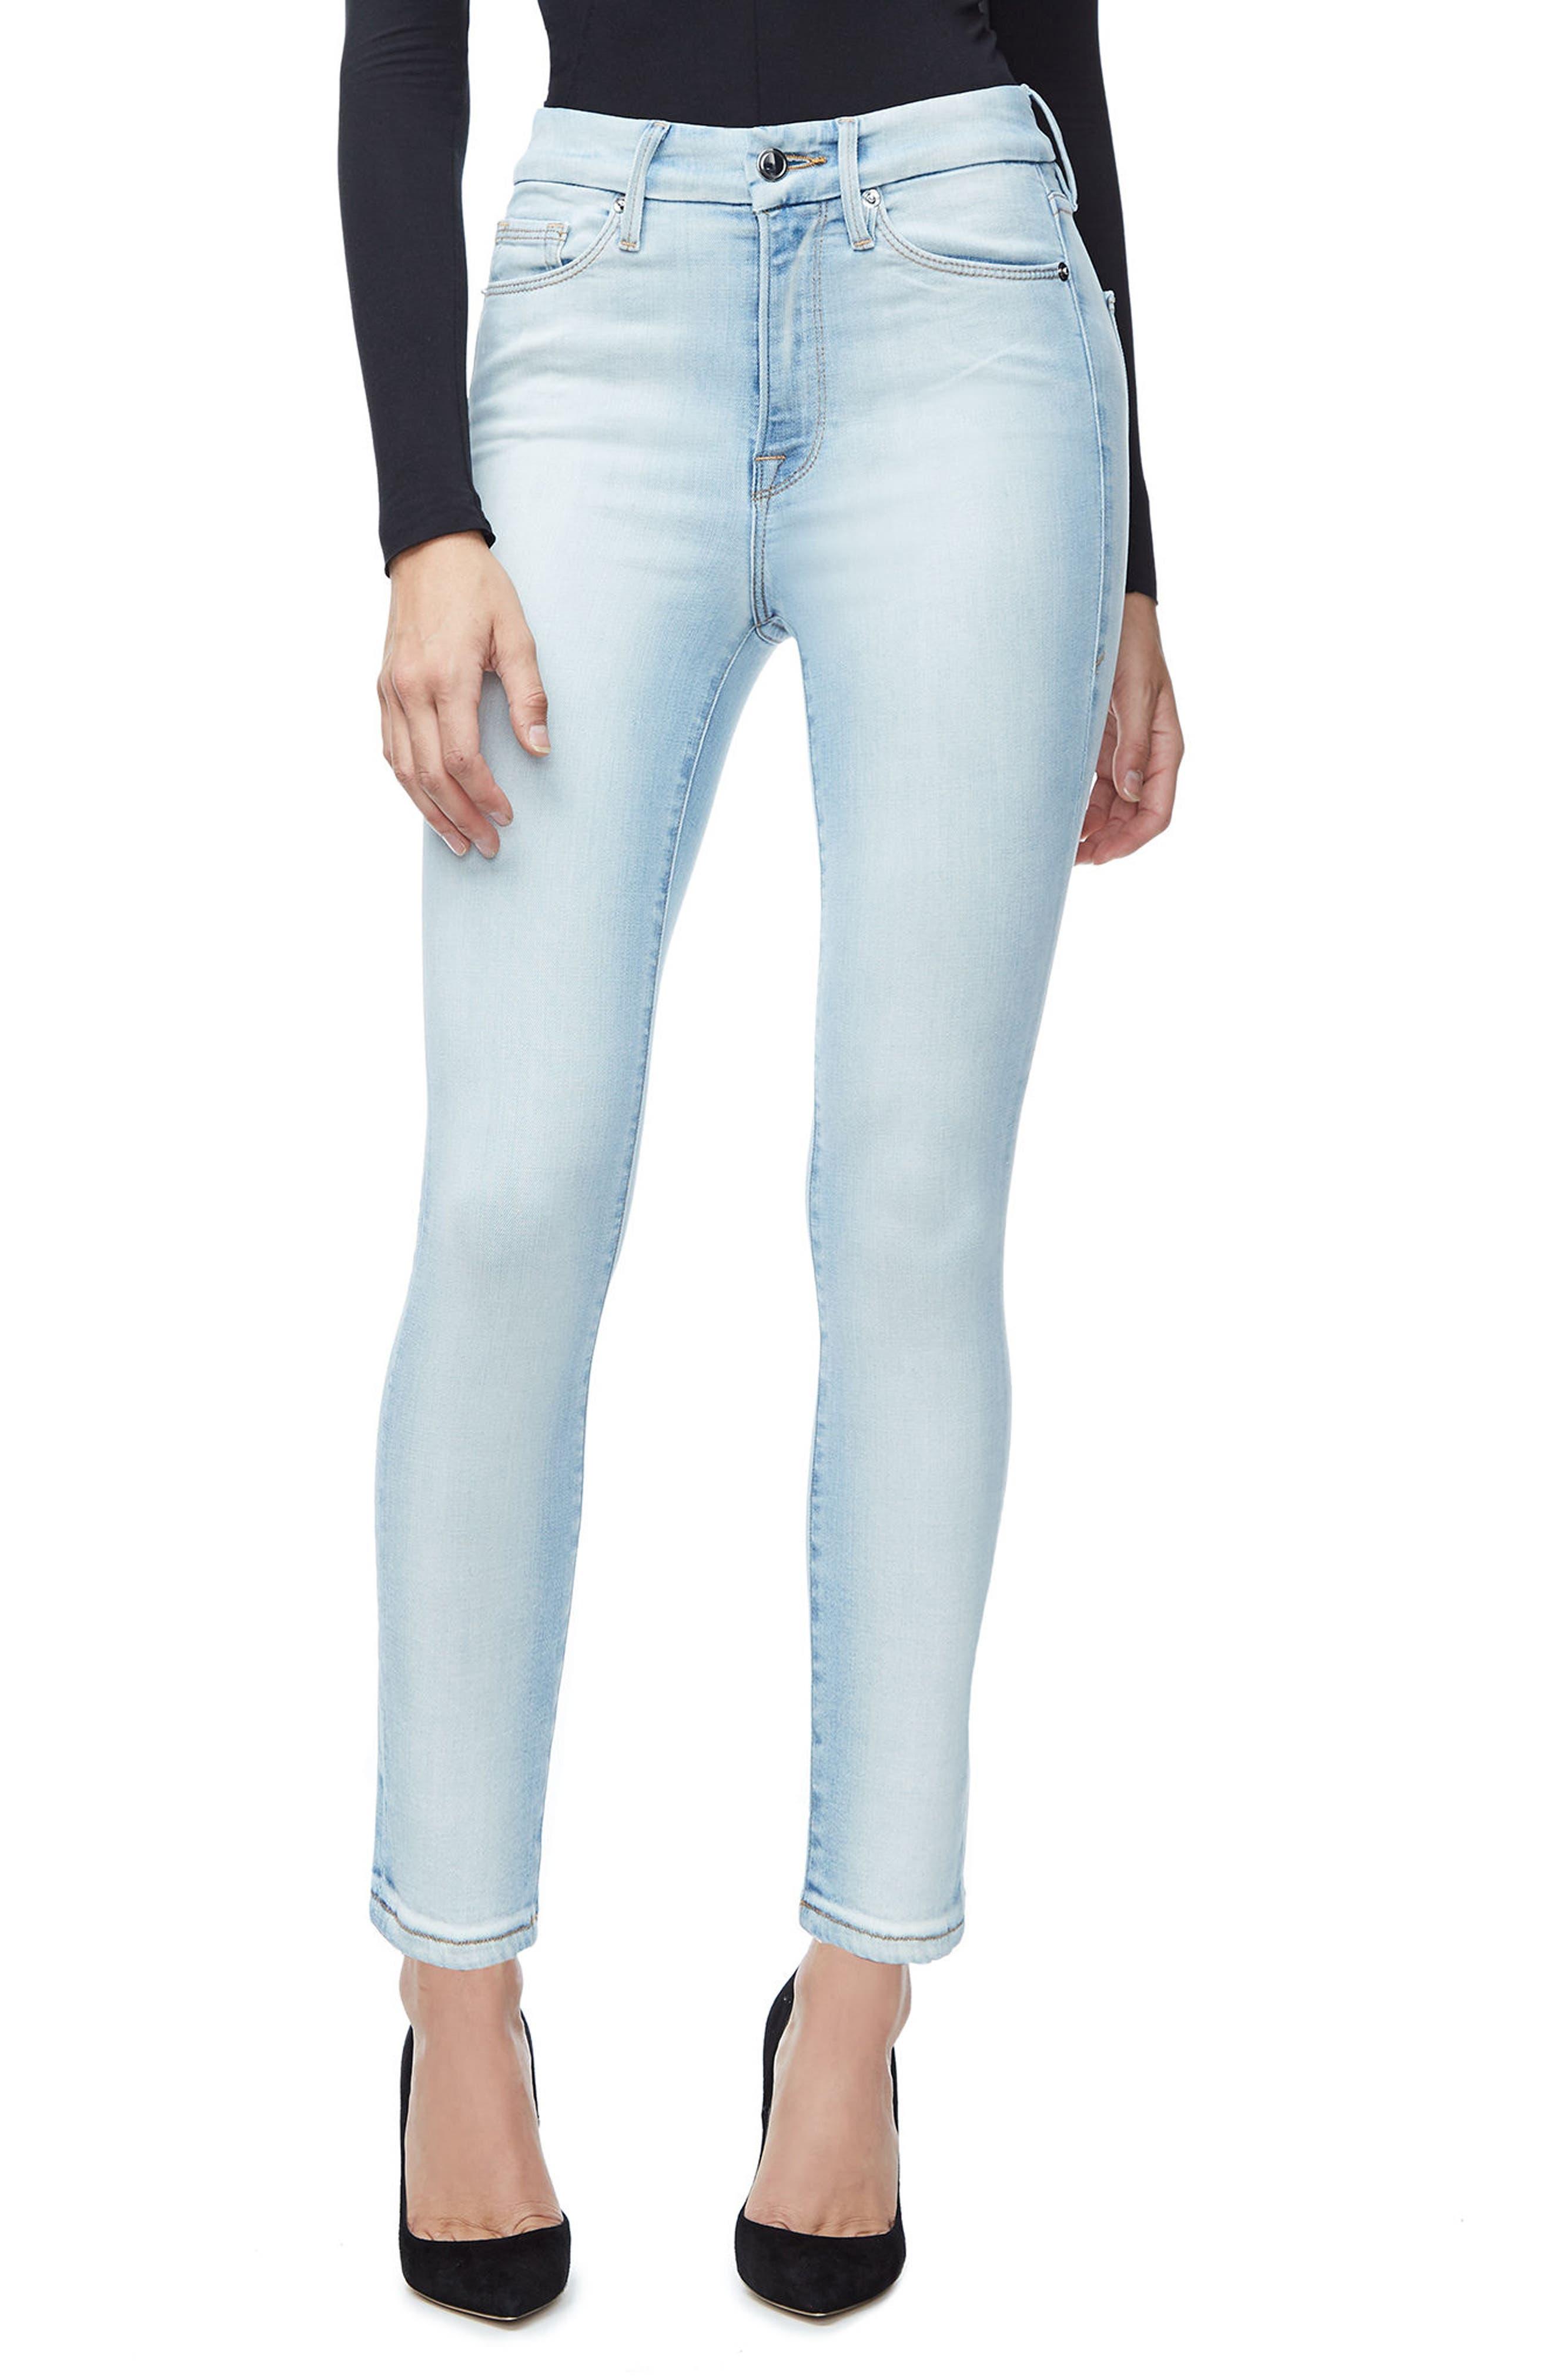 Alternate Image 1 Selected - Good American Good Waist Skinny Jeans (Blue 116) (Regular & Plus Size)